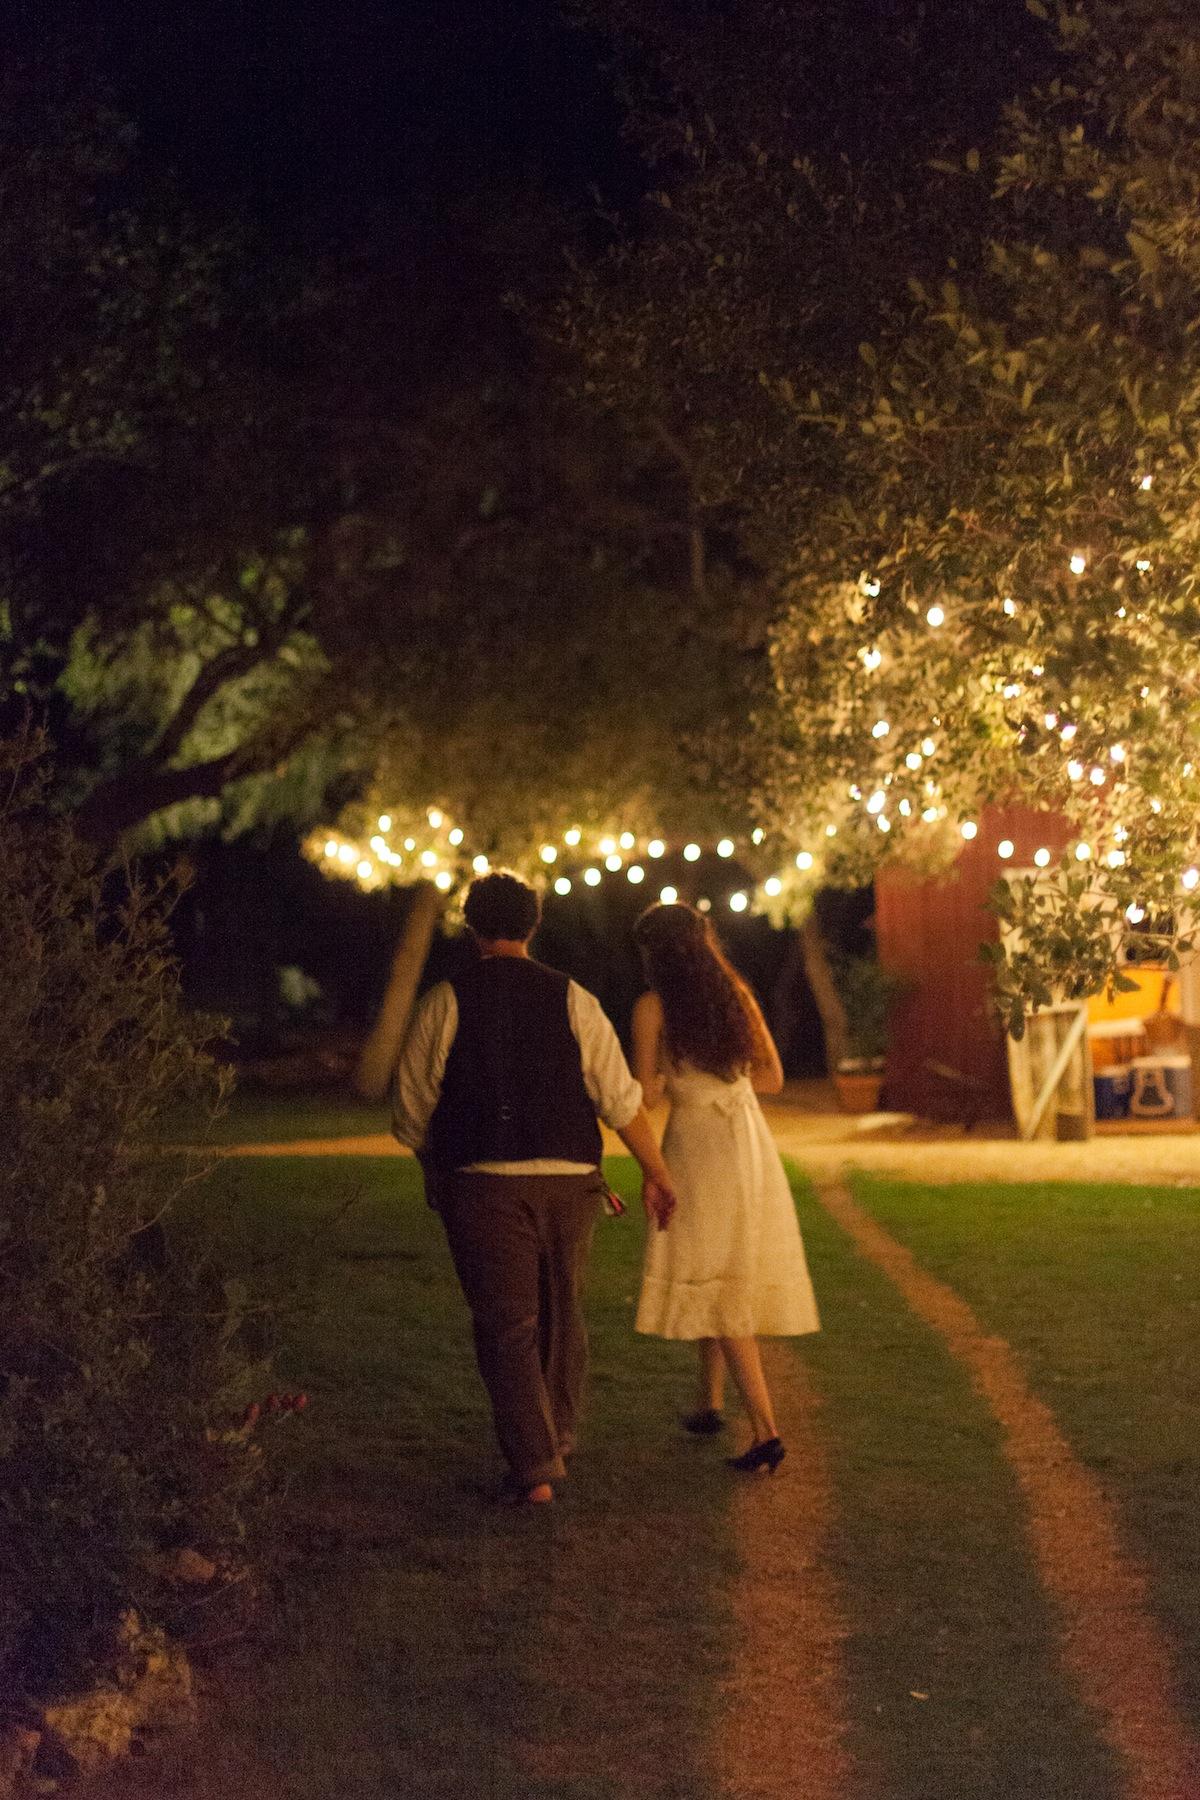 Austin-Wedding-Photographers-Photography-Wildfower-Barn-65.jpg